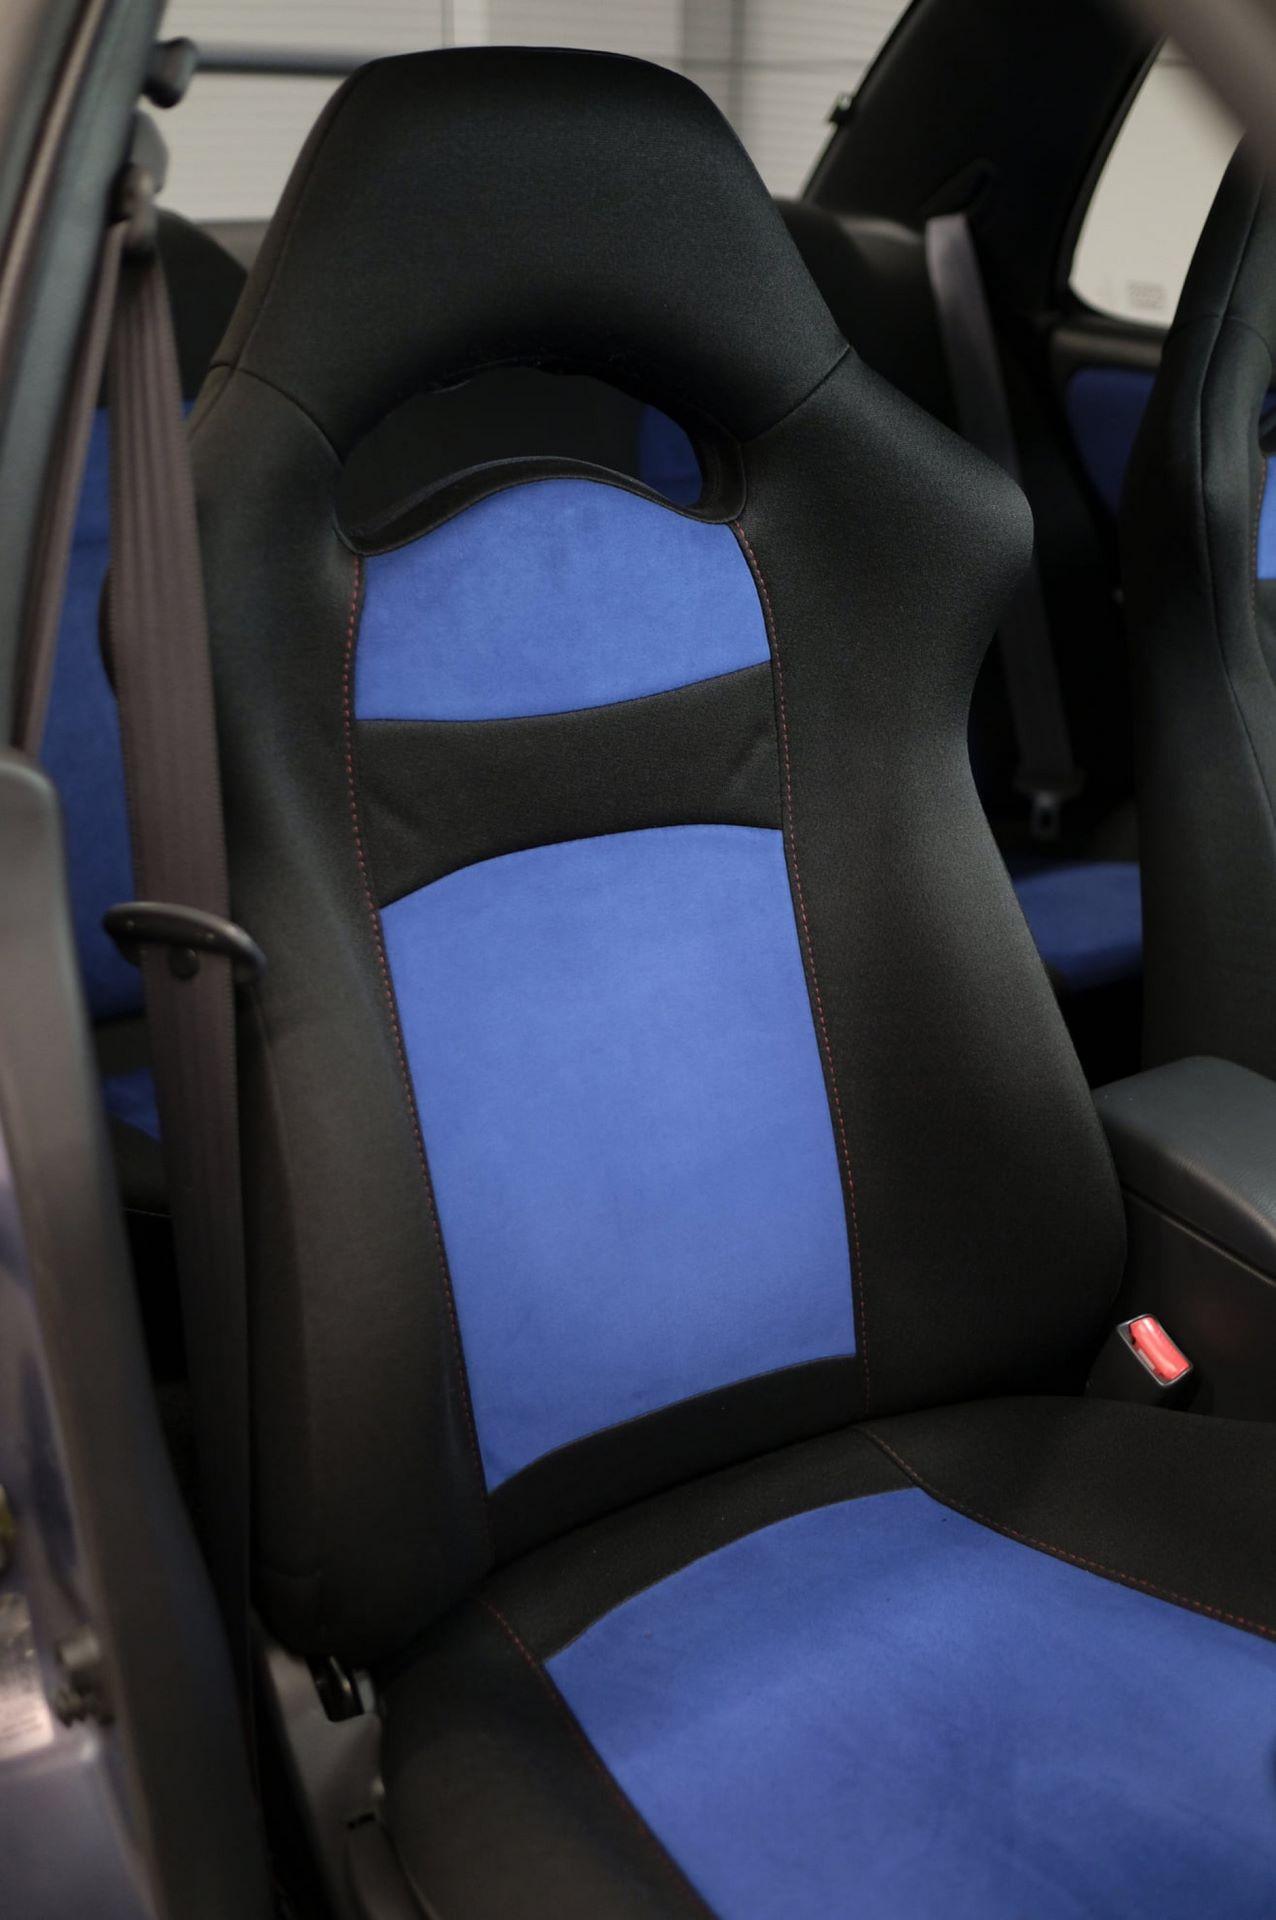 Subaru-Impreza-RB5-1999-9